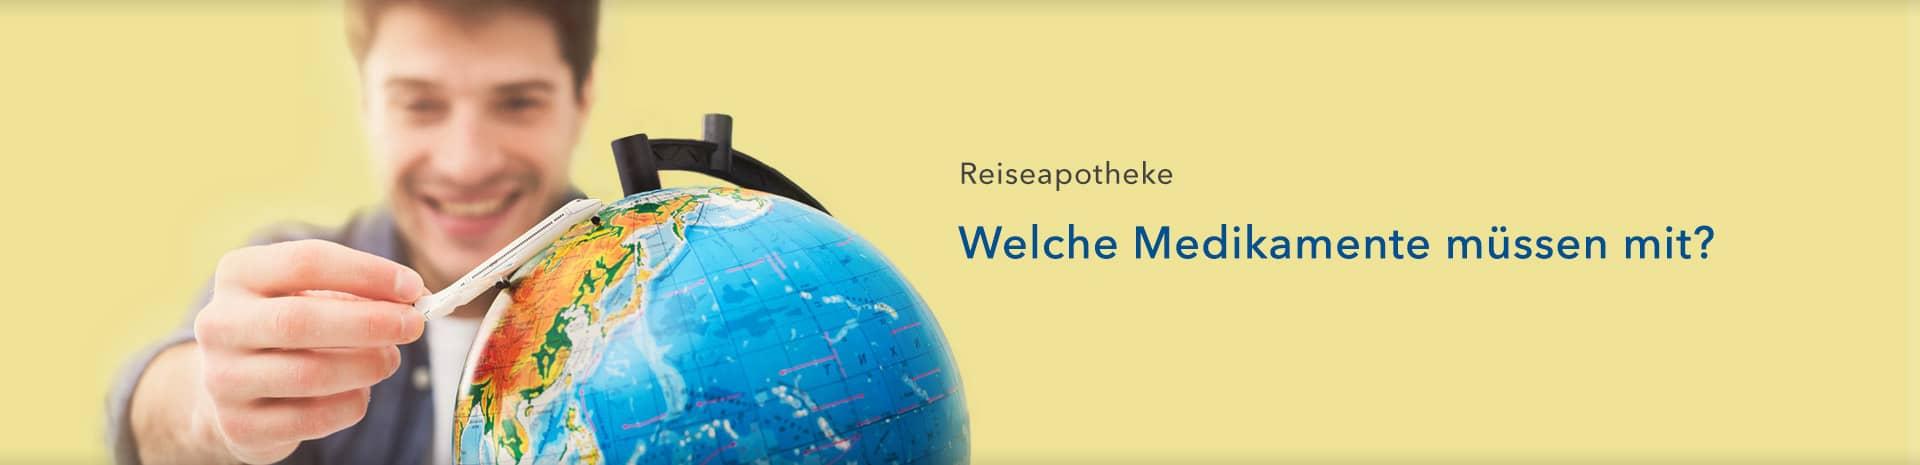 Reiseapotheke - Ratgeber Ihrer Online Apotheke